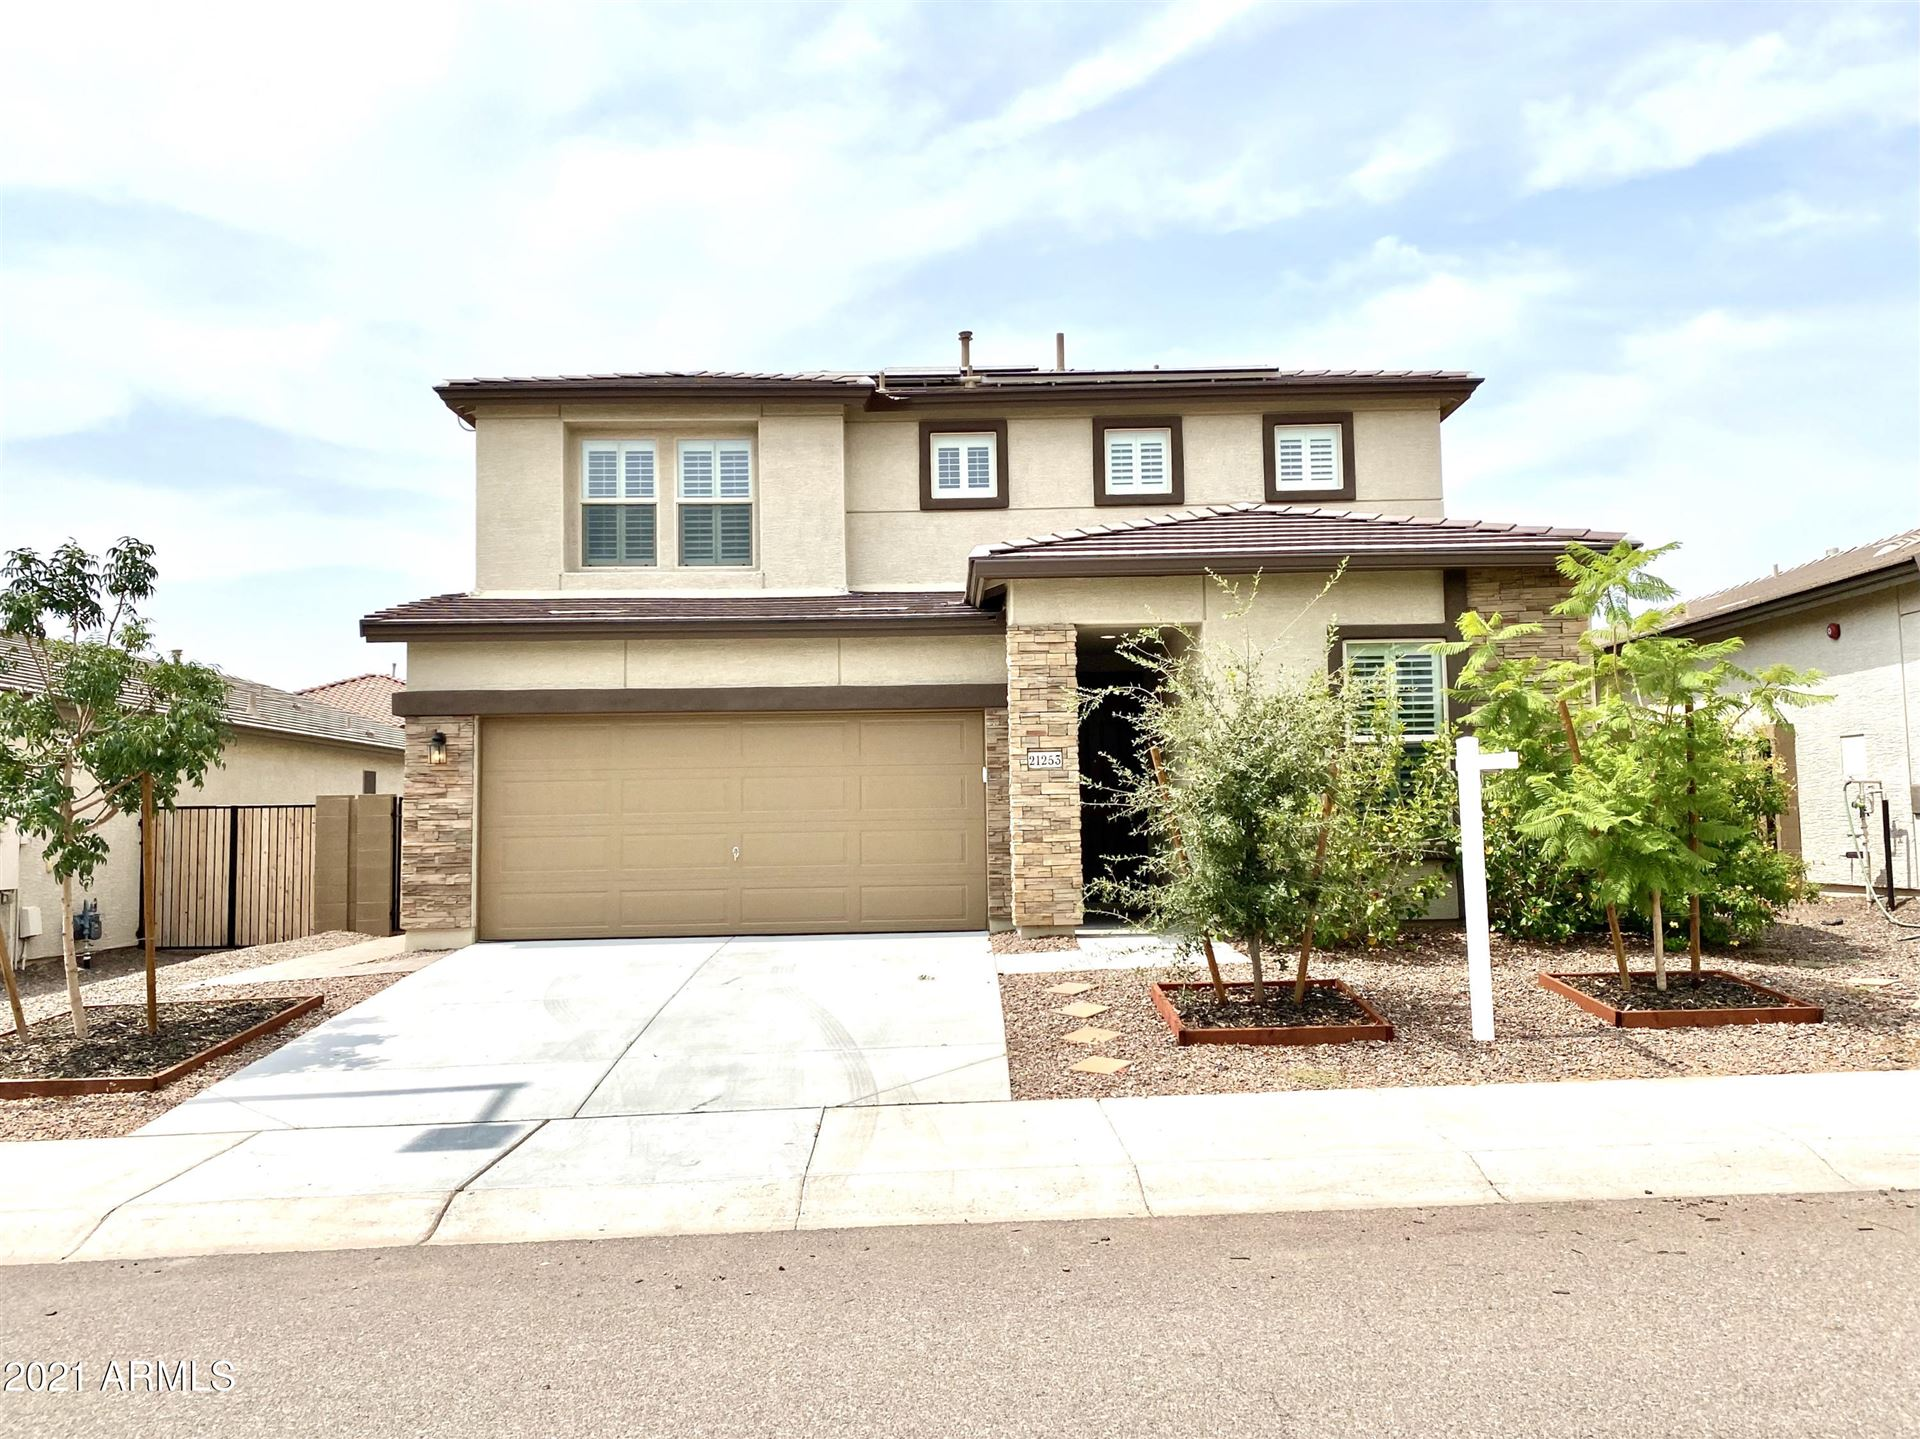 21253 W ALMERIA Road, Buckeye, AZ 85396 - MLS#: 6257424